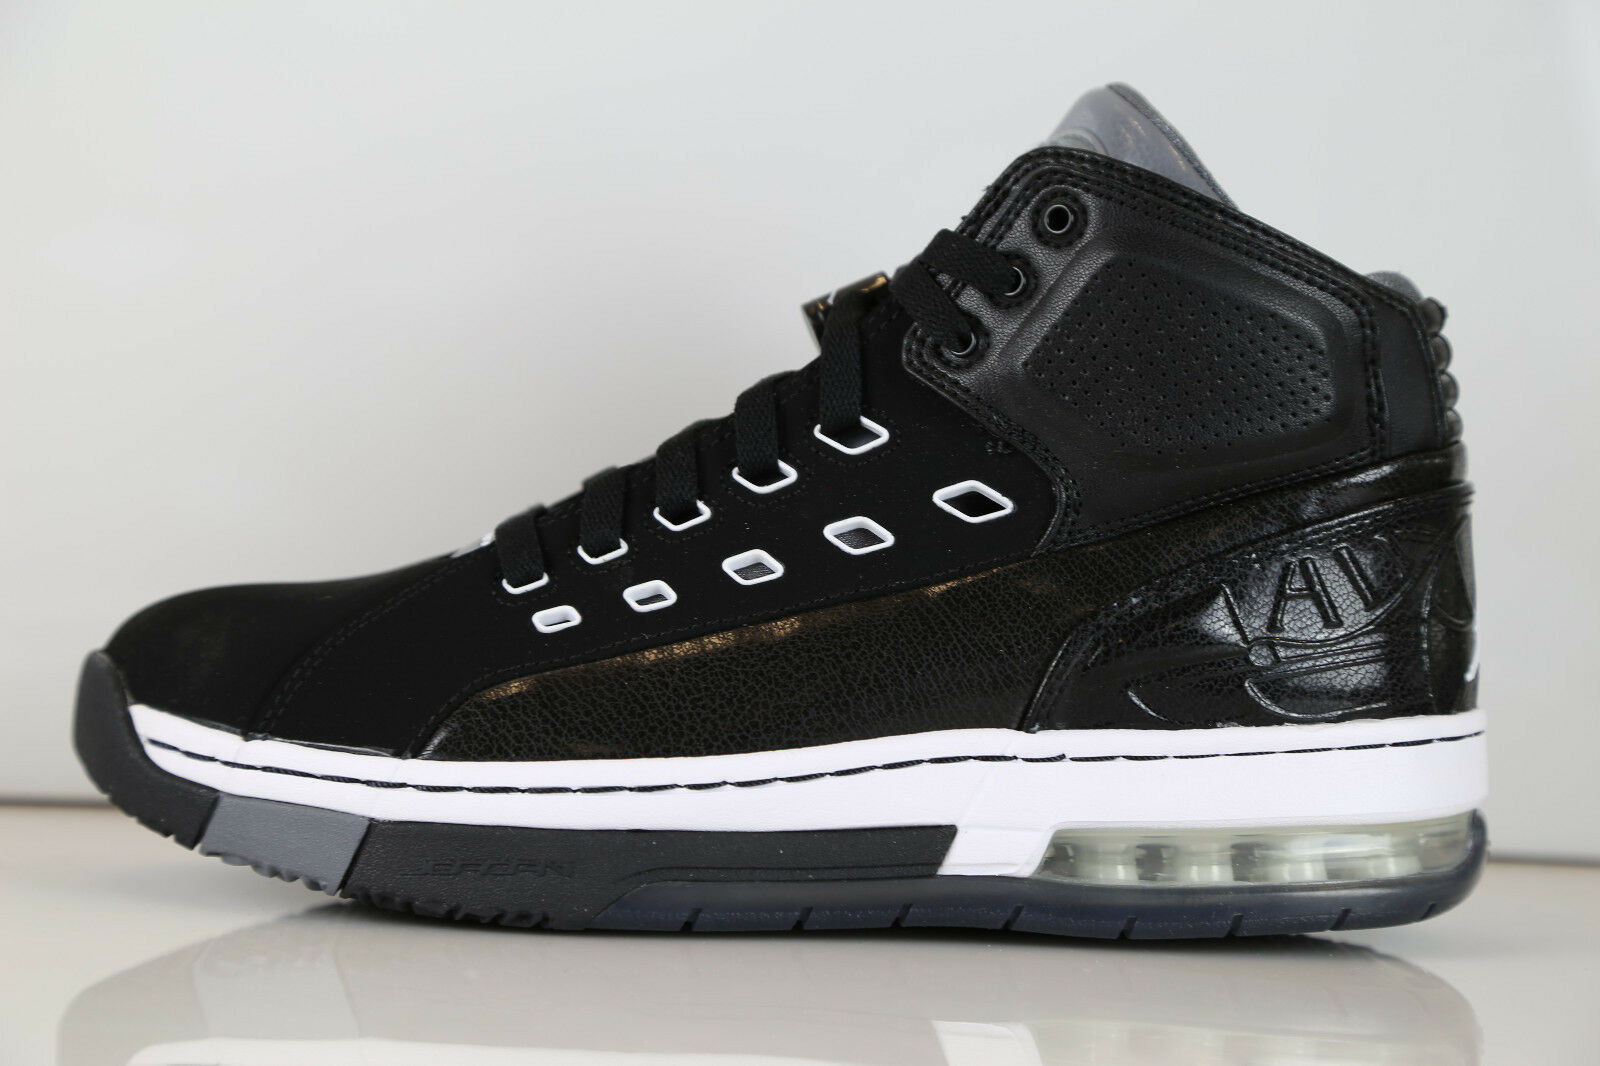 Nike Air Jordan Ol' School Black White Cool Grey 317223-013 8-14 1 retro 3 11 4 The most popular shoes for men and women